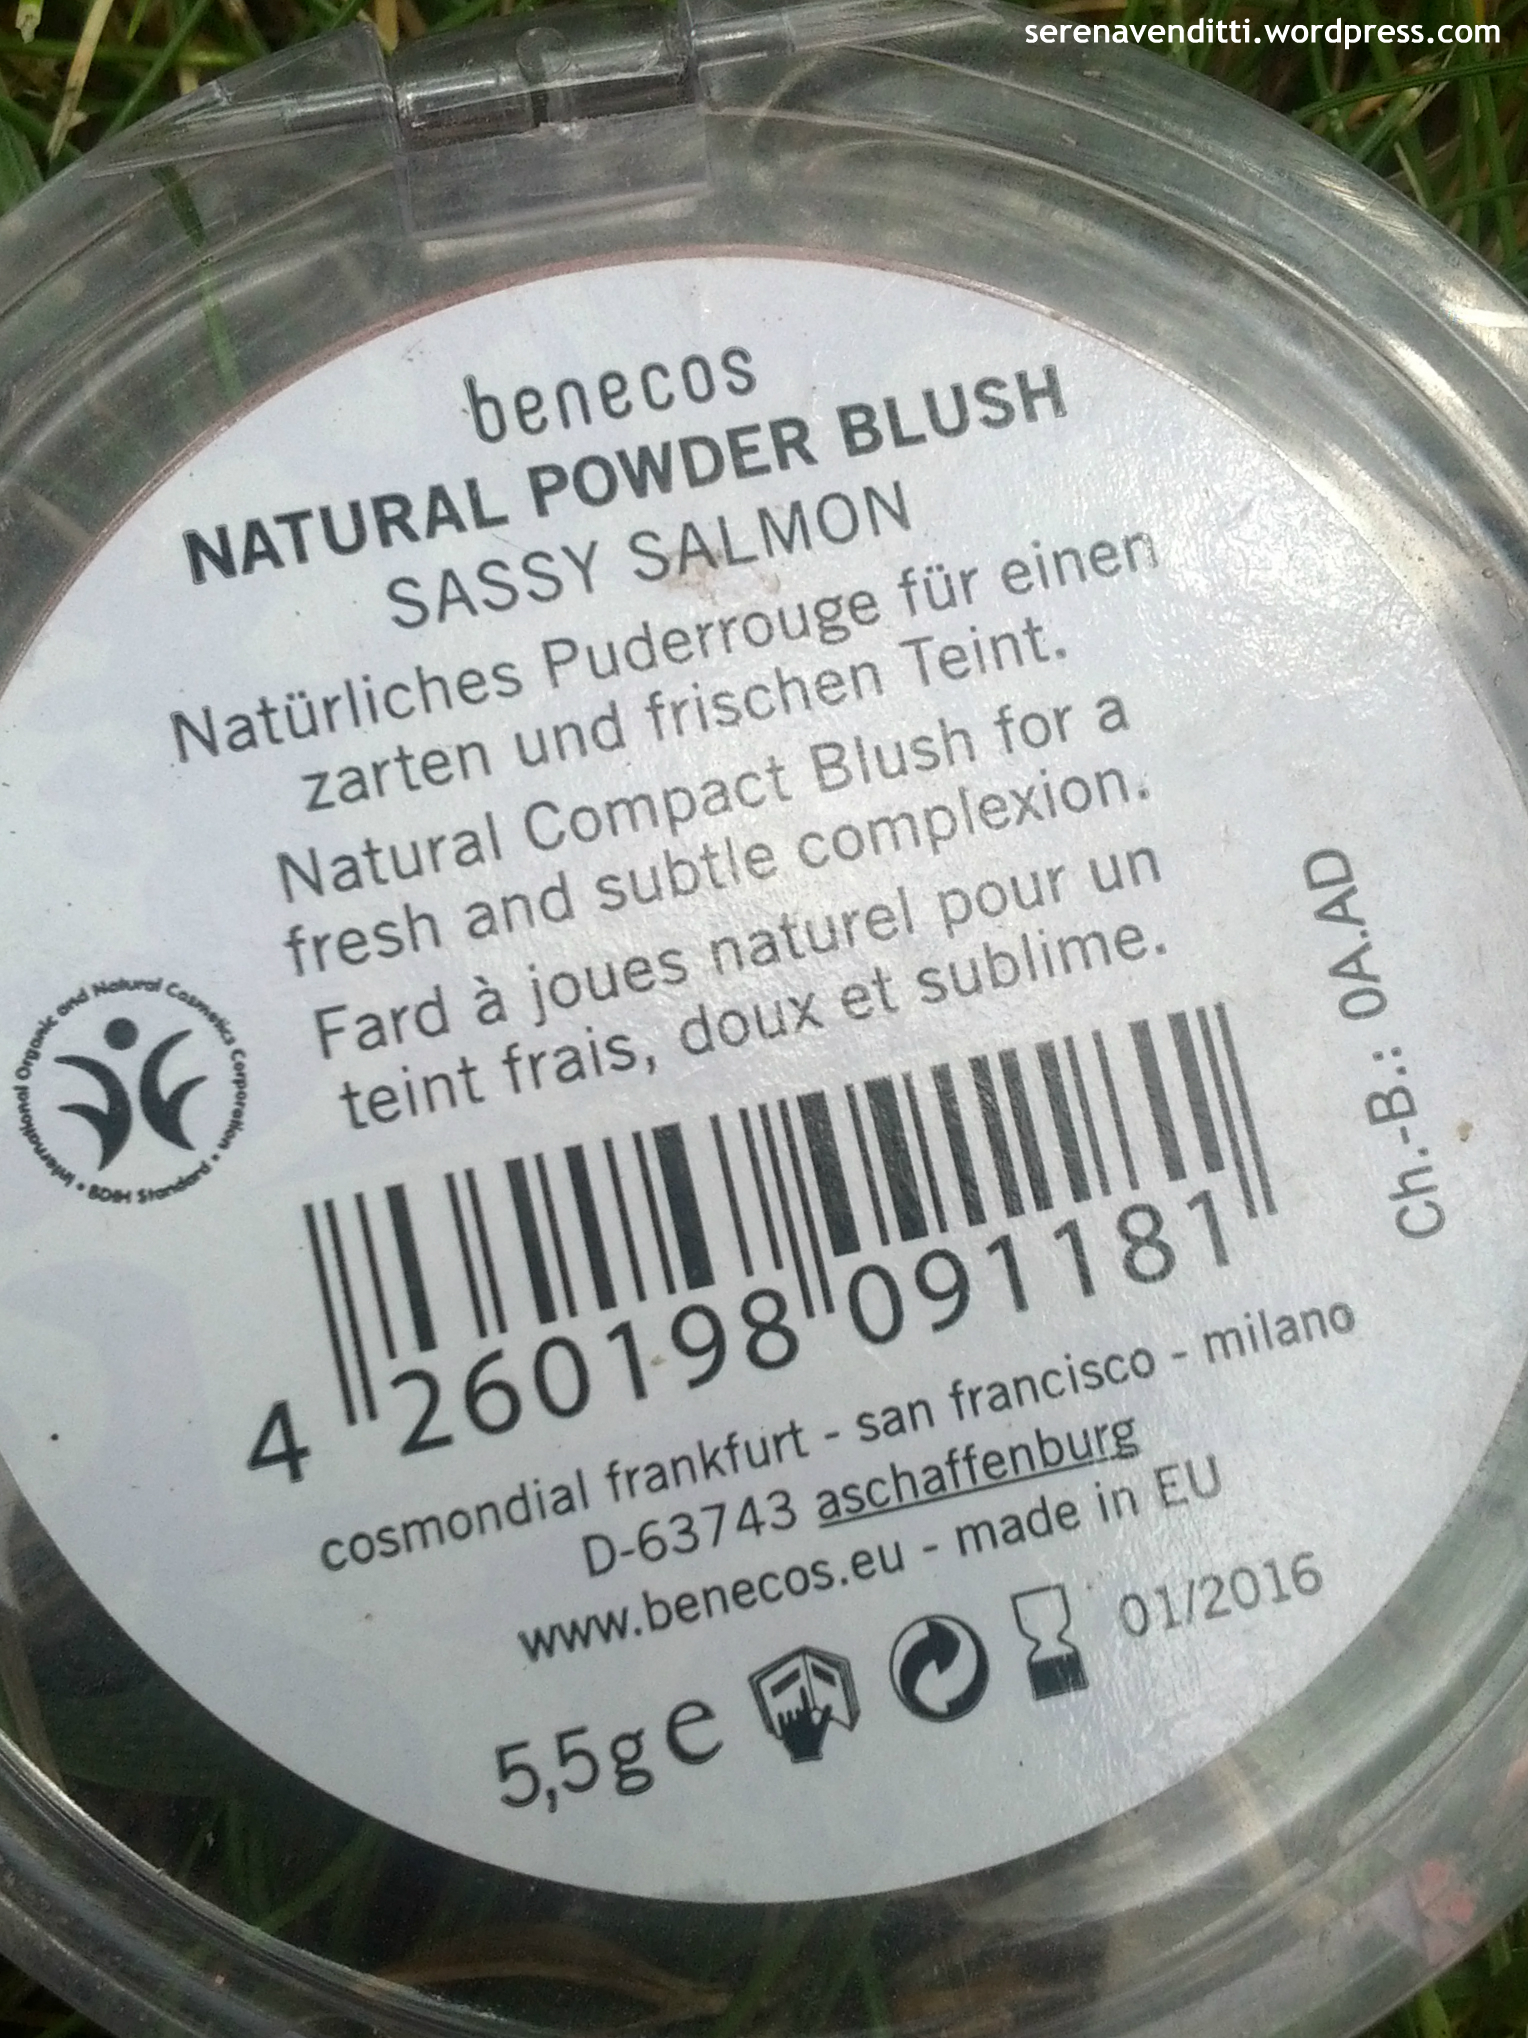 NaturalPowderBlushBenecos3